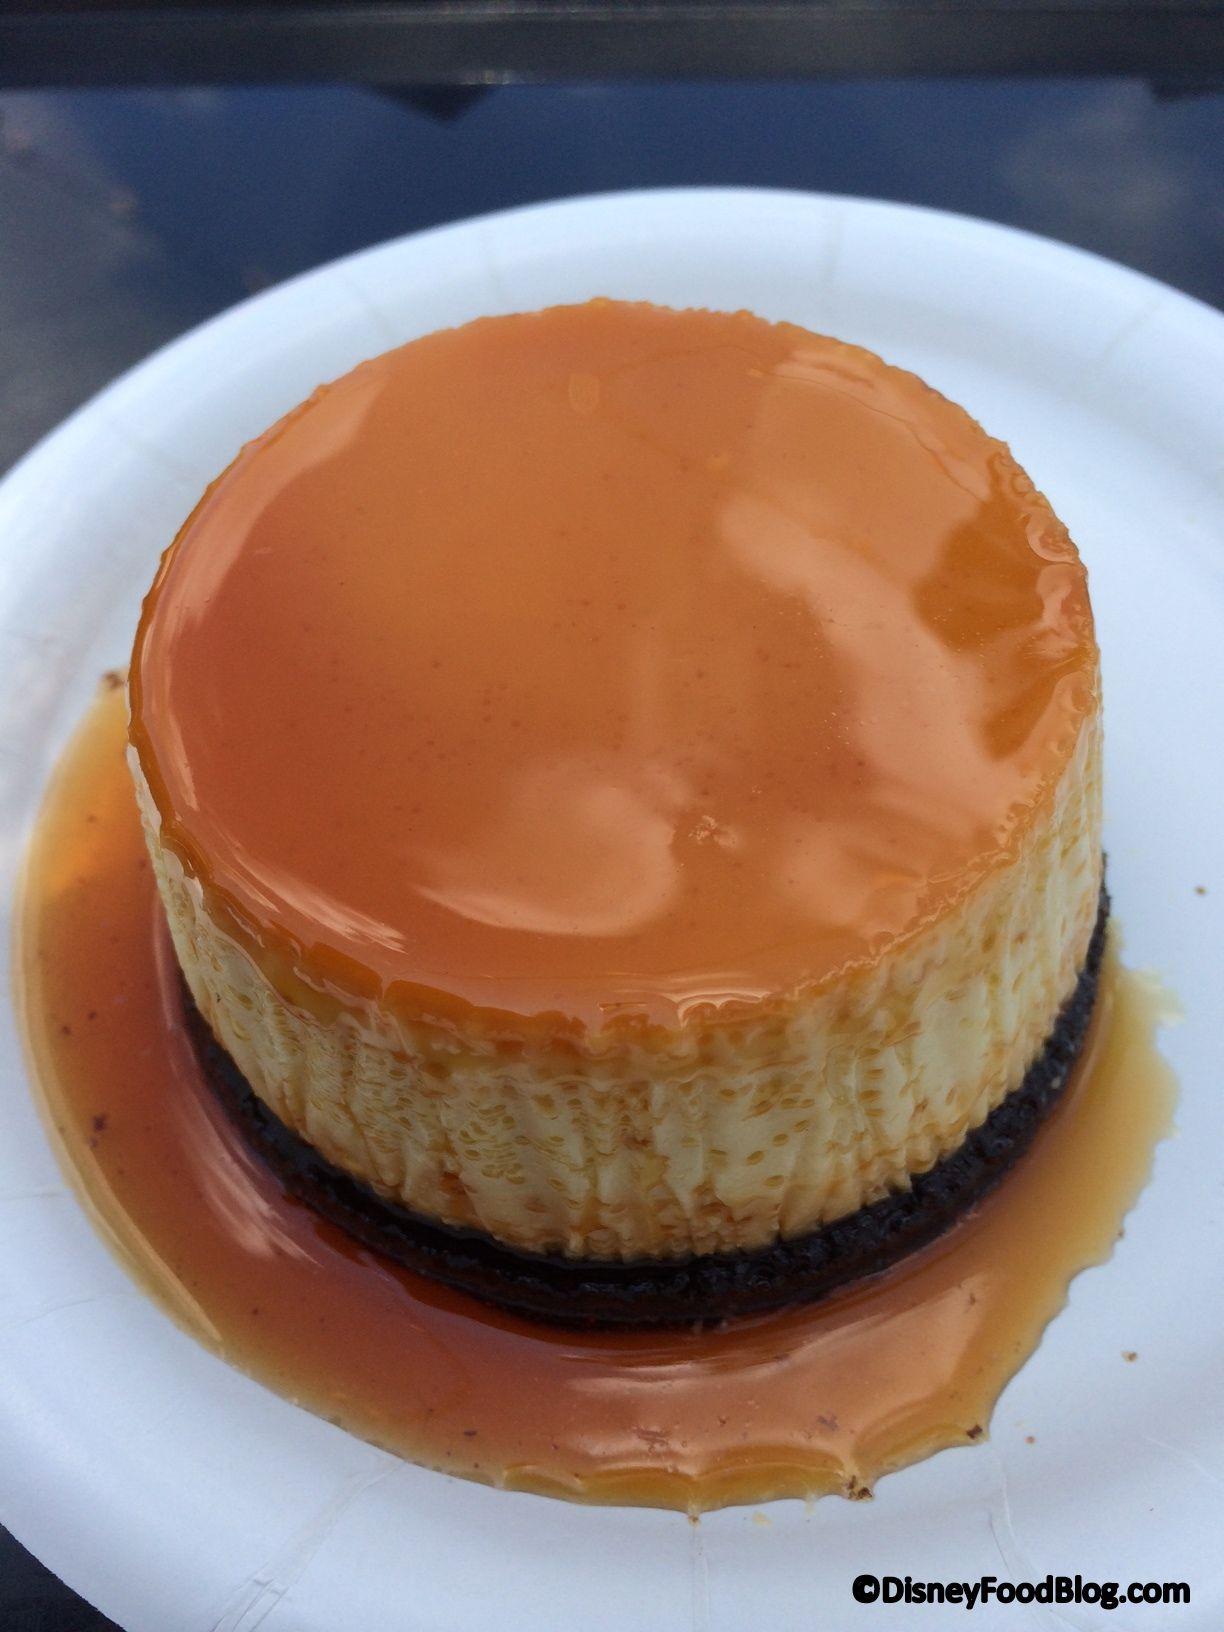 Flancocho puerto rico very custardy 2014 epcot food wine cake forumfinder Choice Image